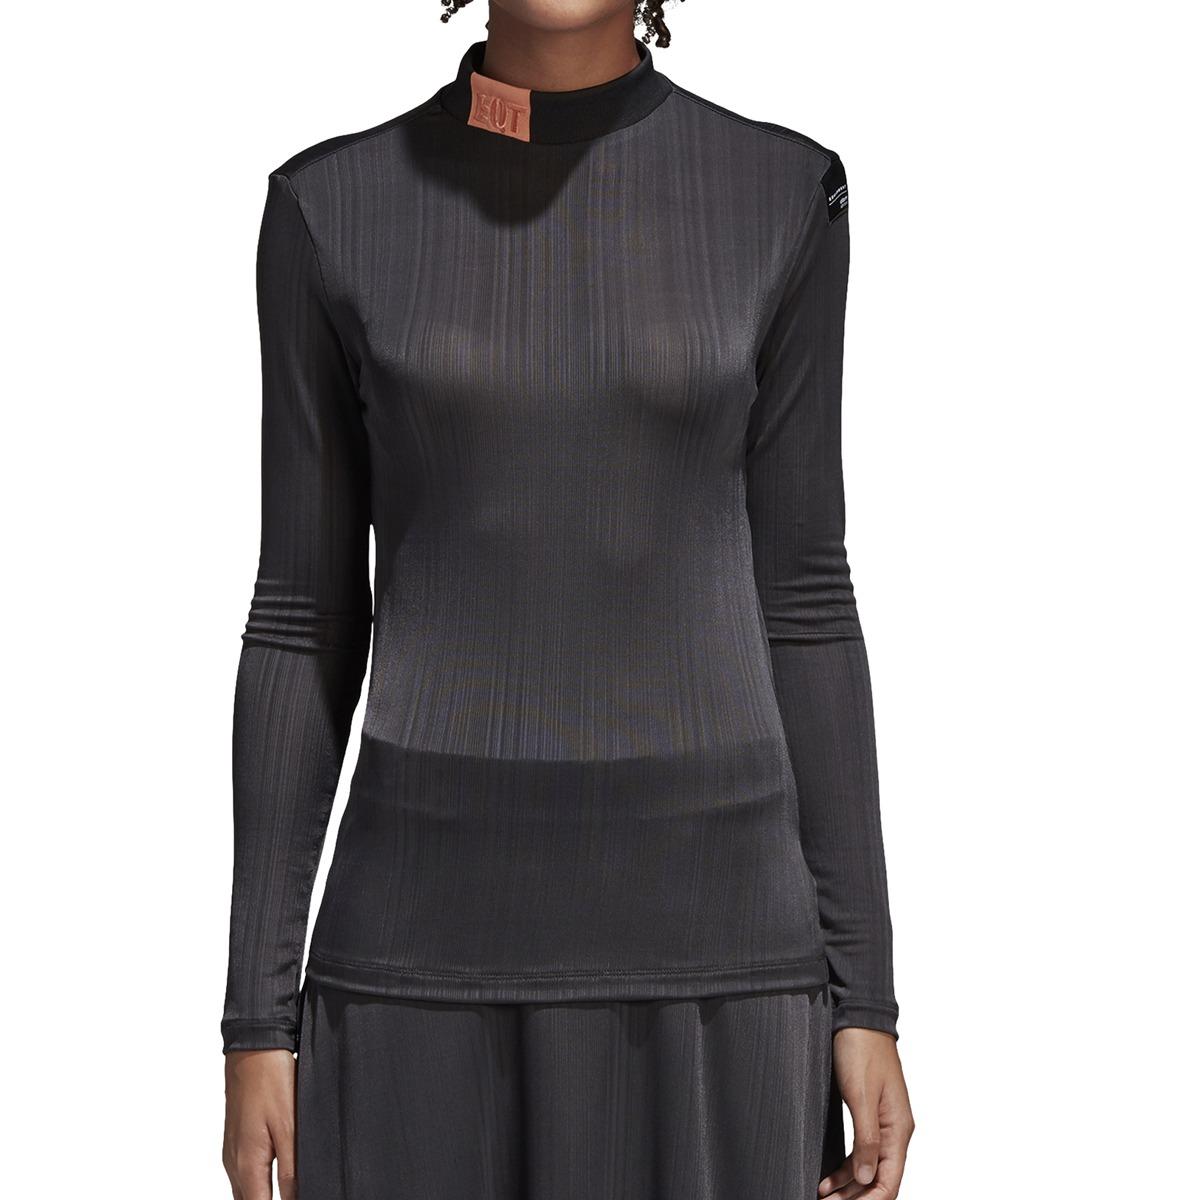 remera adidas originals moda eqt ls t-shirt mujer gf. Cargando zoom. c7975217f838e